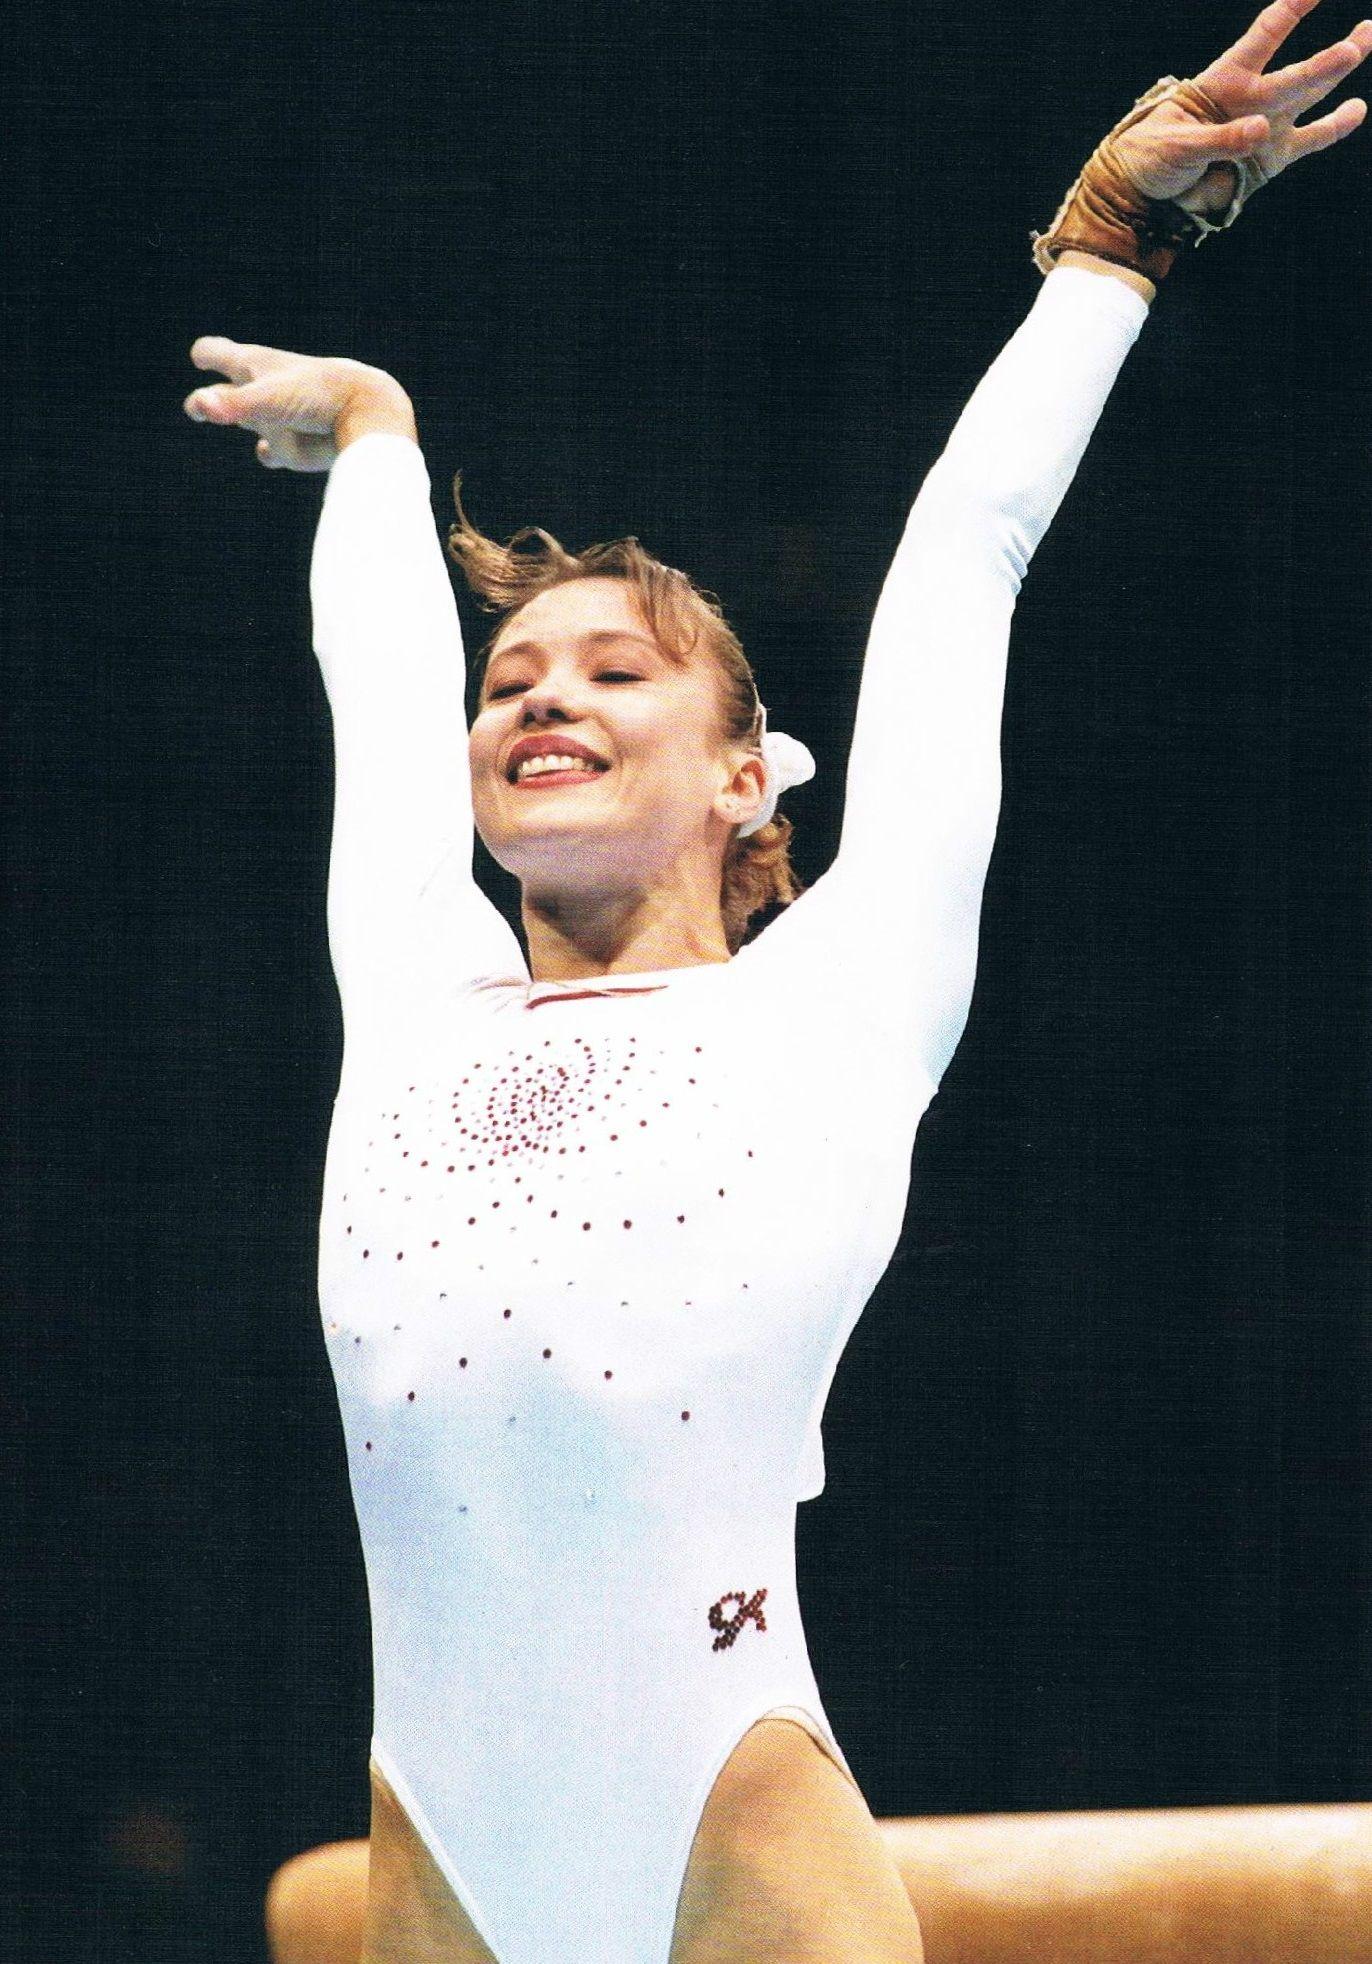 Watch Tatiana Lysenko 3 Olympic medals in gymnastics video